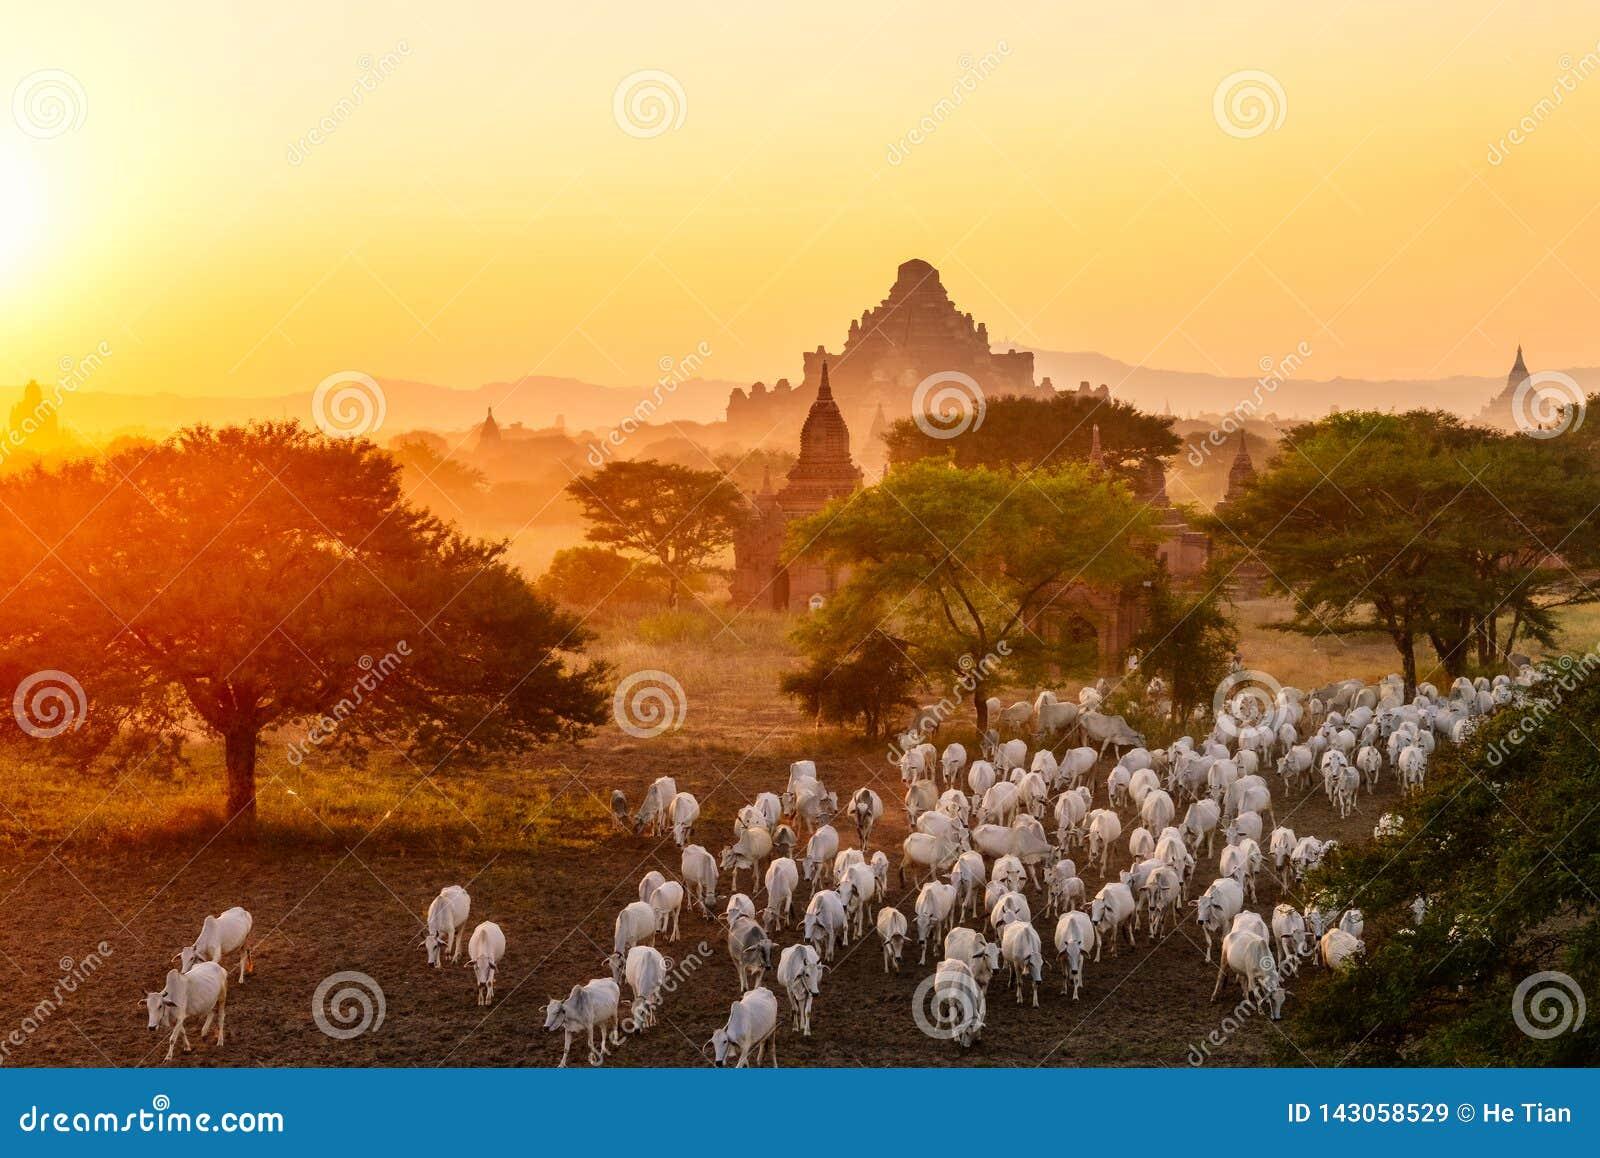 Flock av nötkreatur som flyttar sig bland pagoder i Bagan, Myanmar